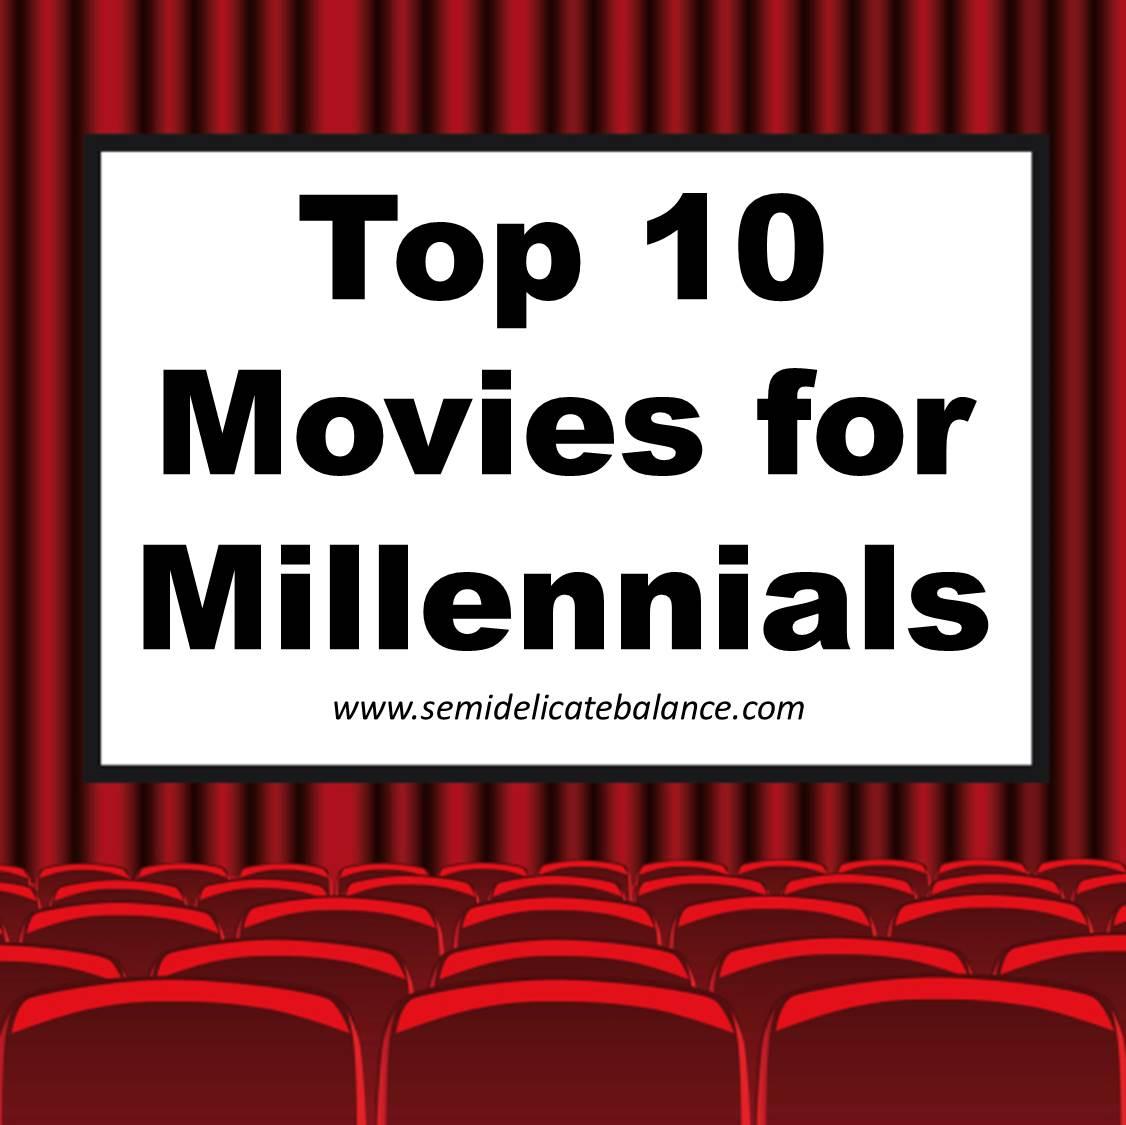 top 10 movies for millennials